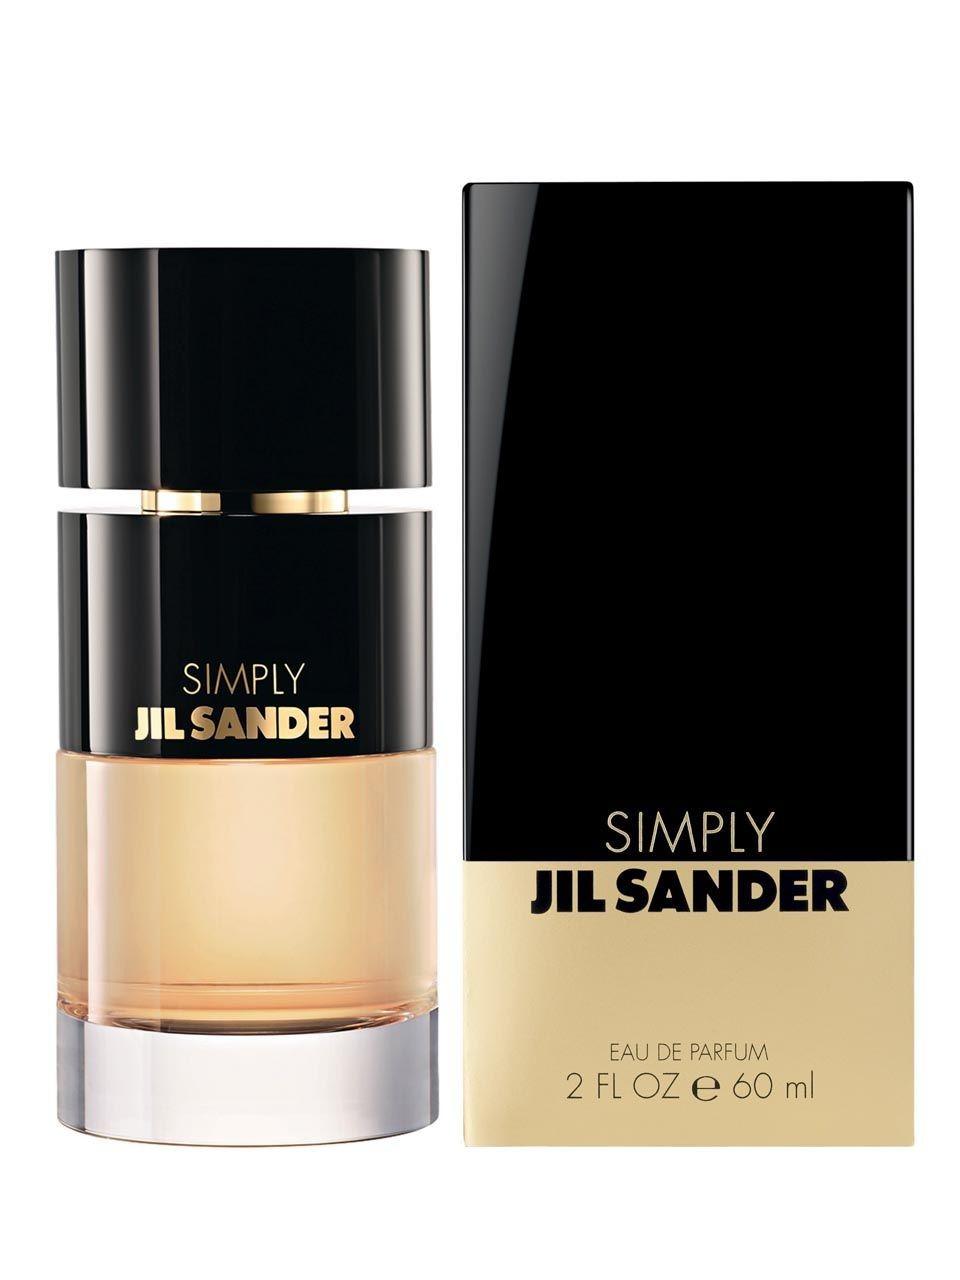 Simply Jil Sander аромат для женщин